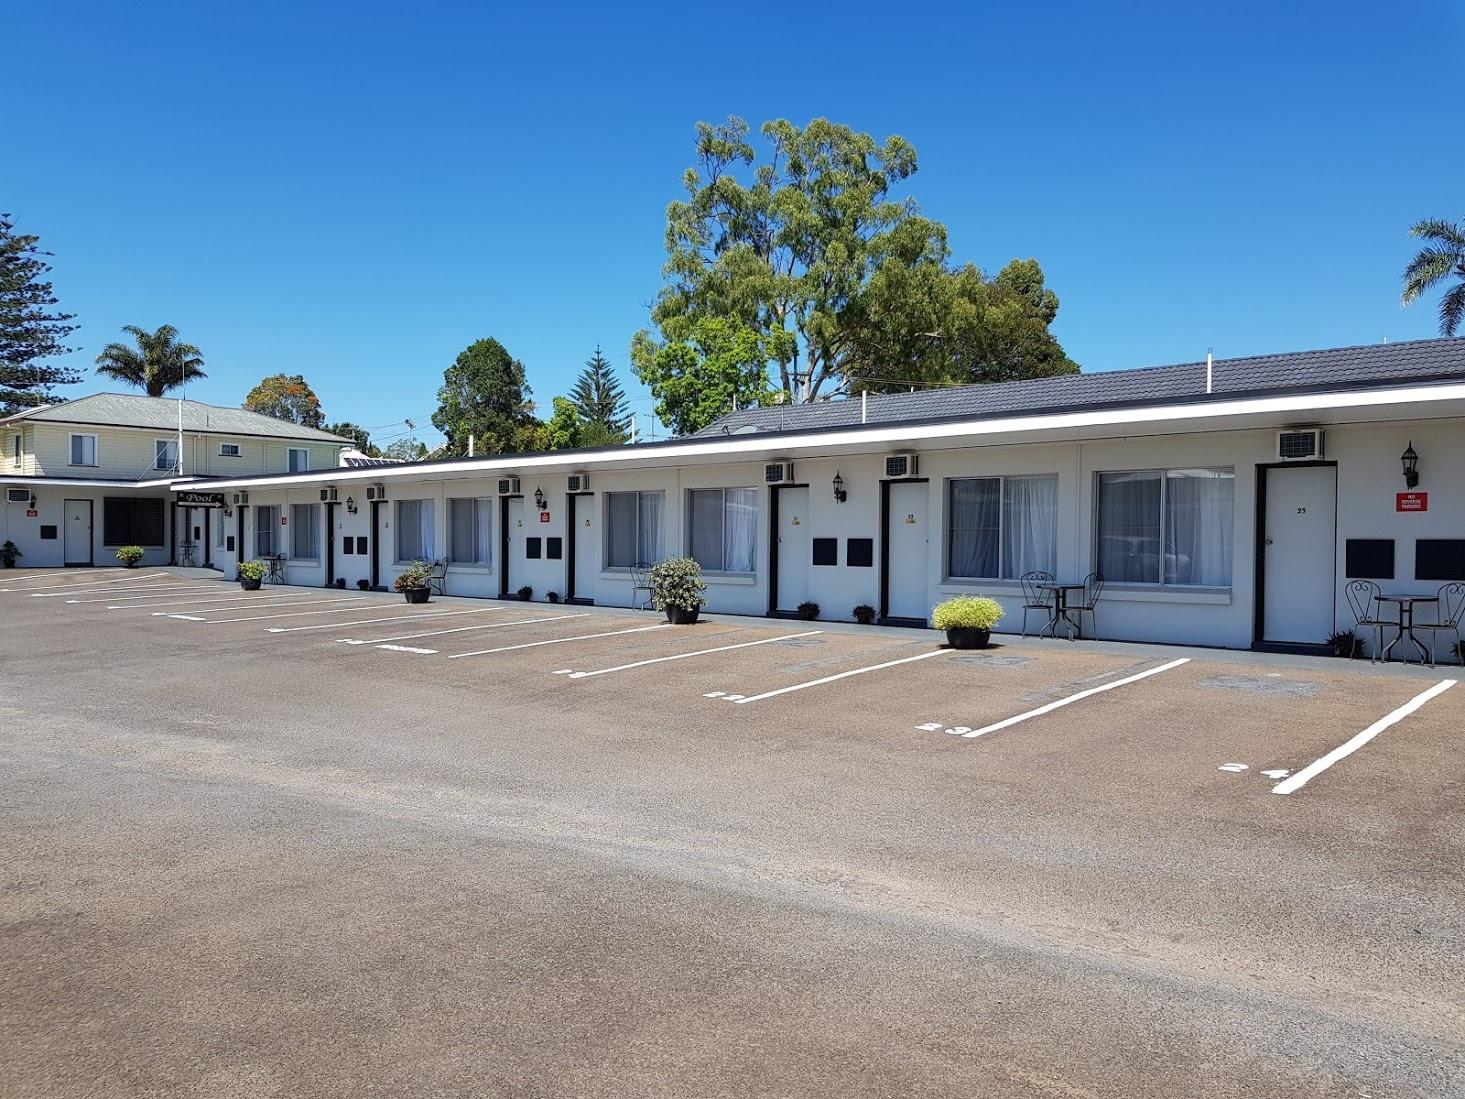 k - Riviera on Ruthven Motel